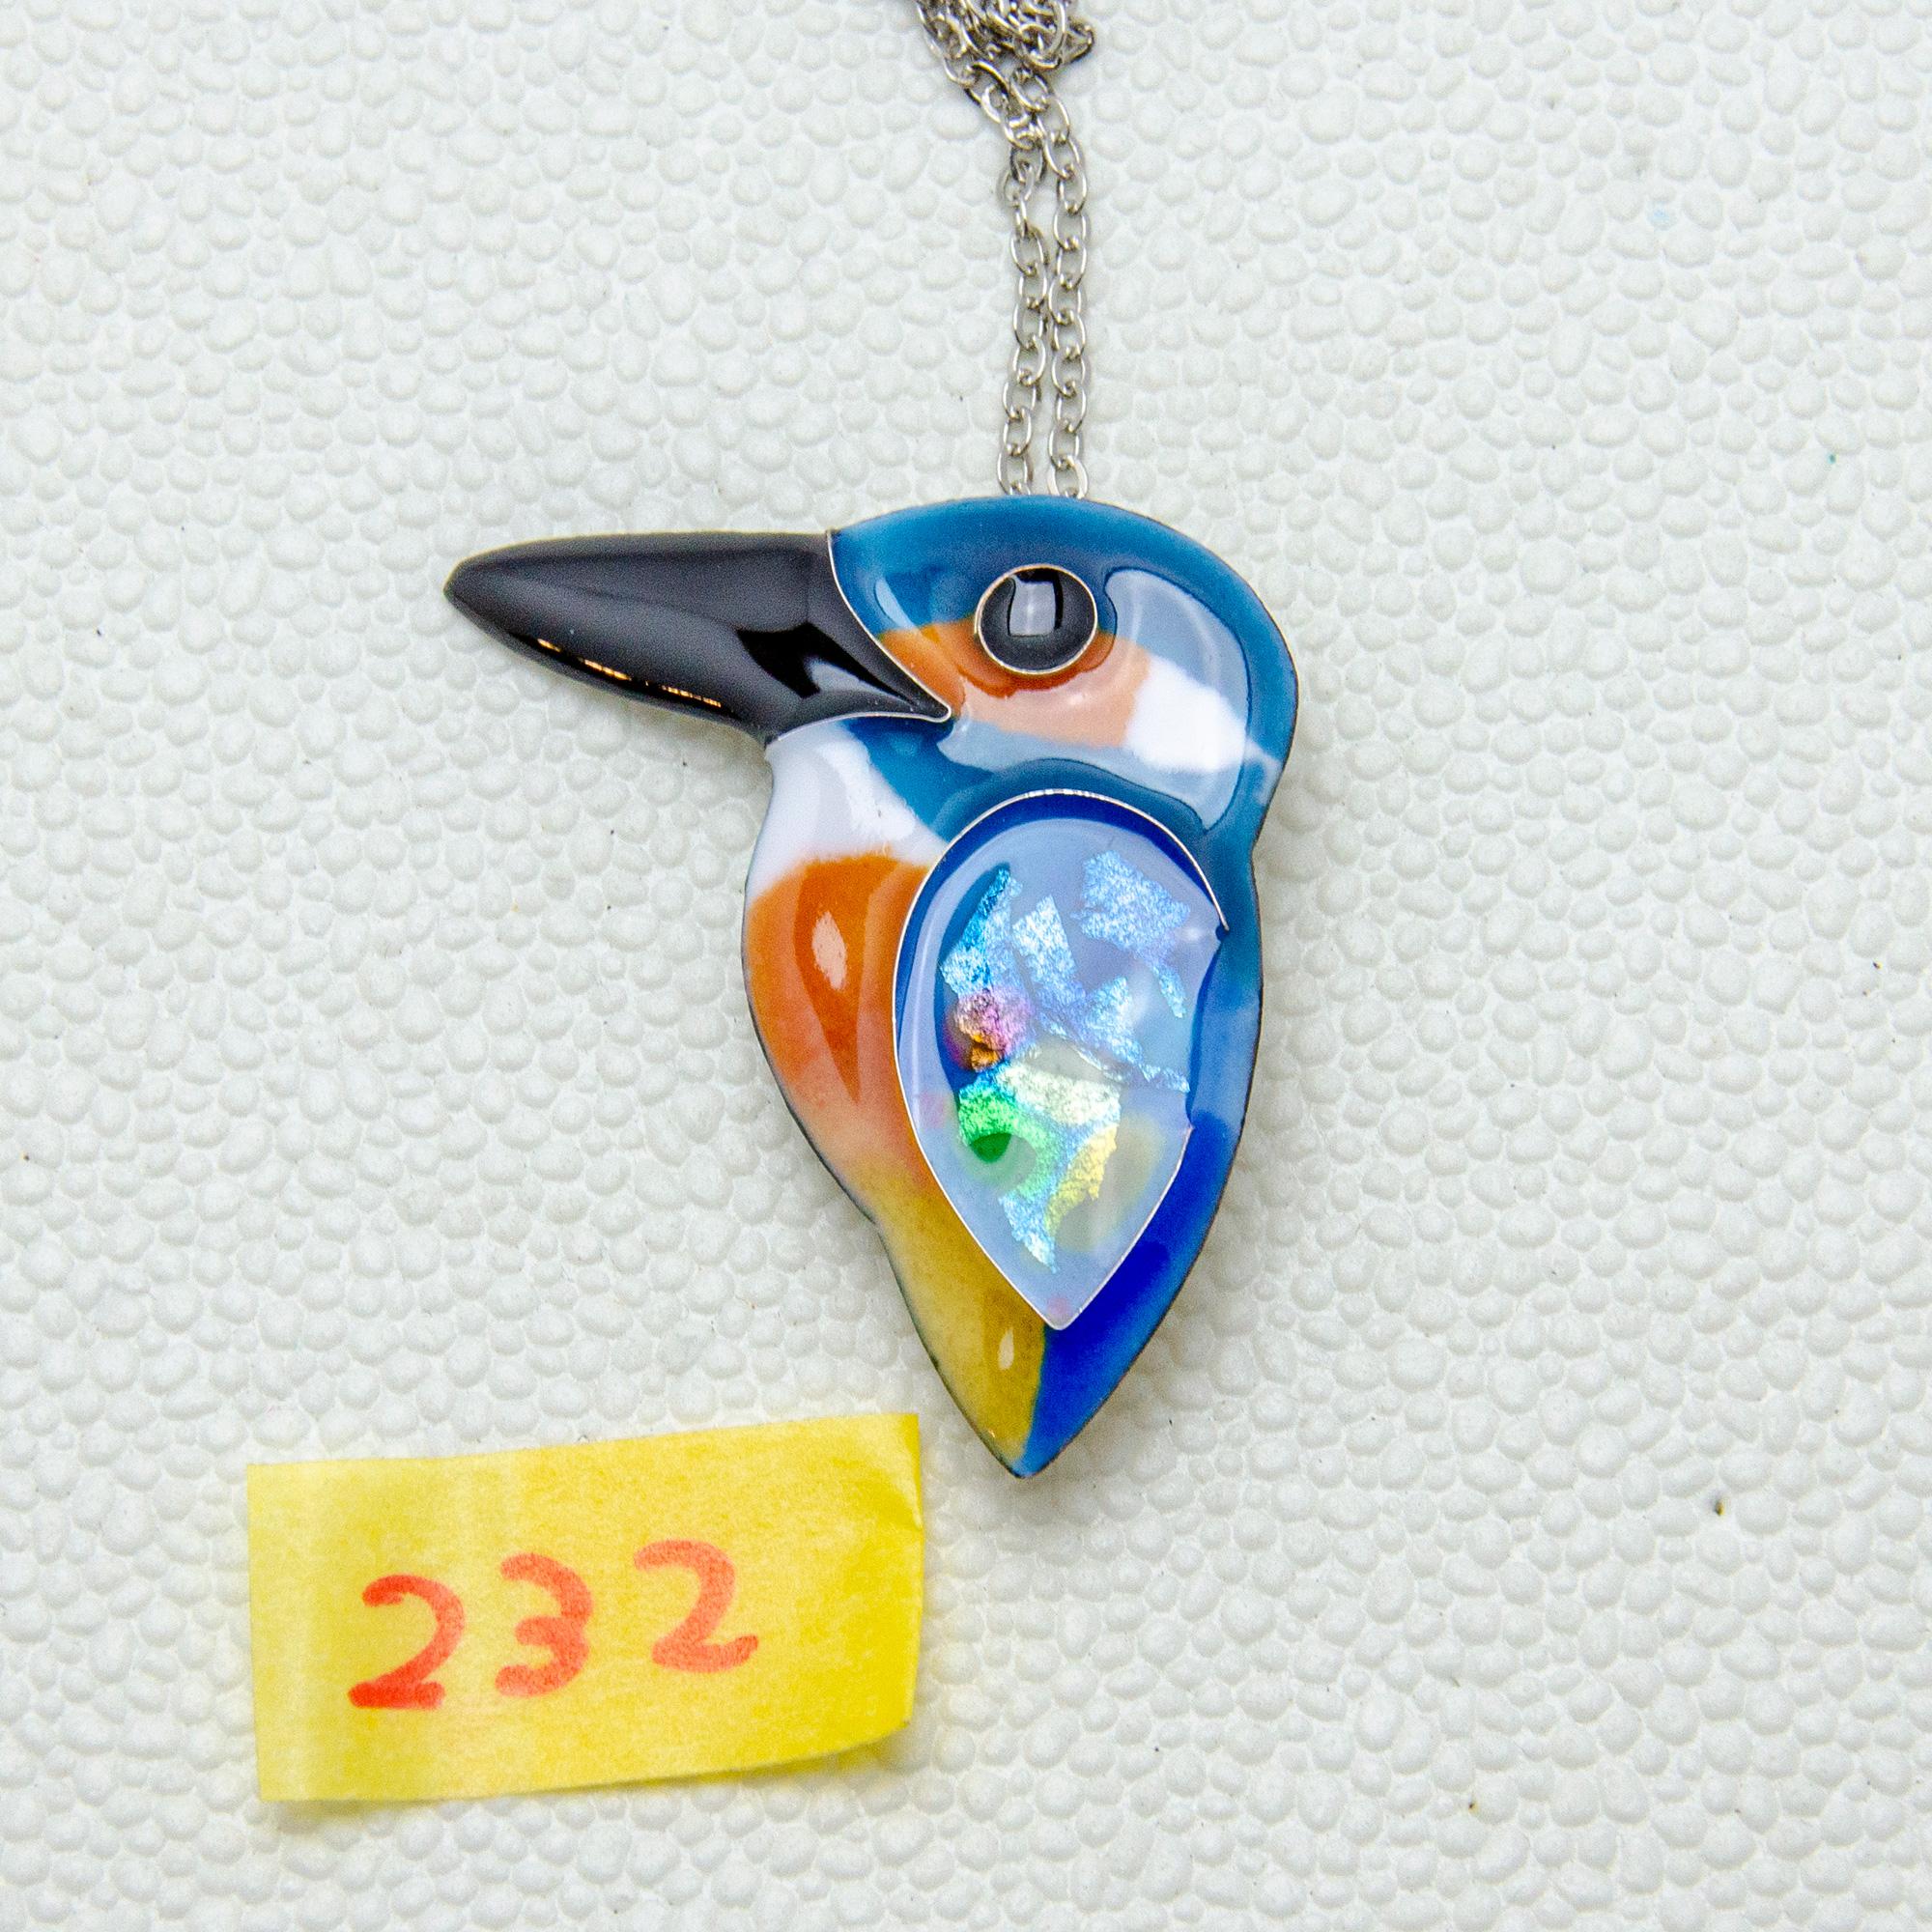 200422-232